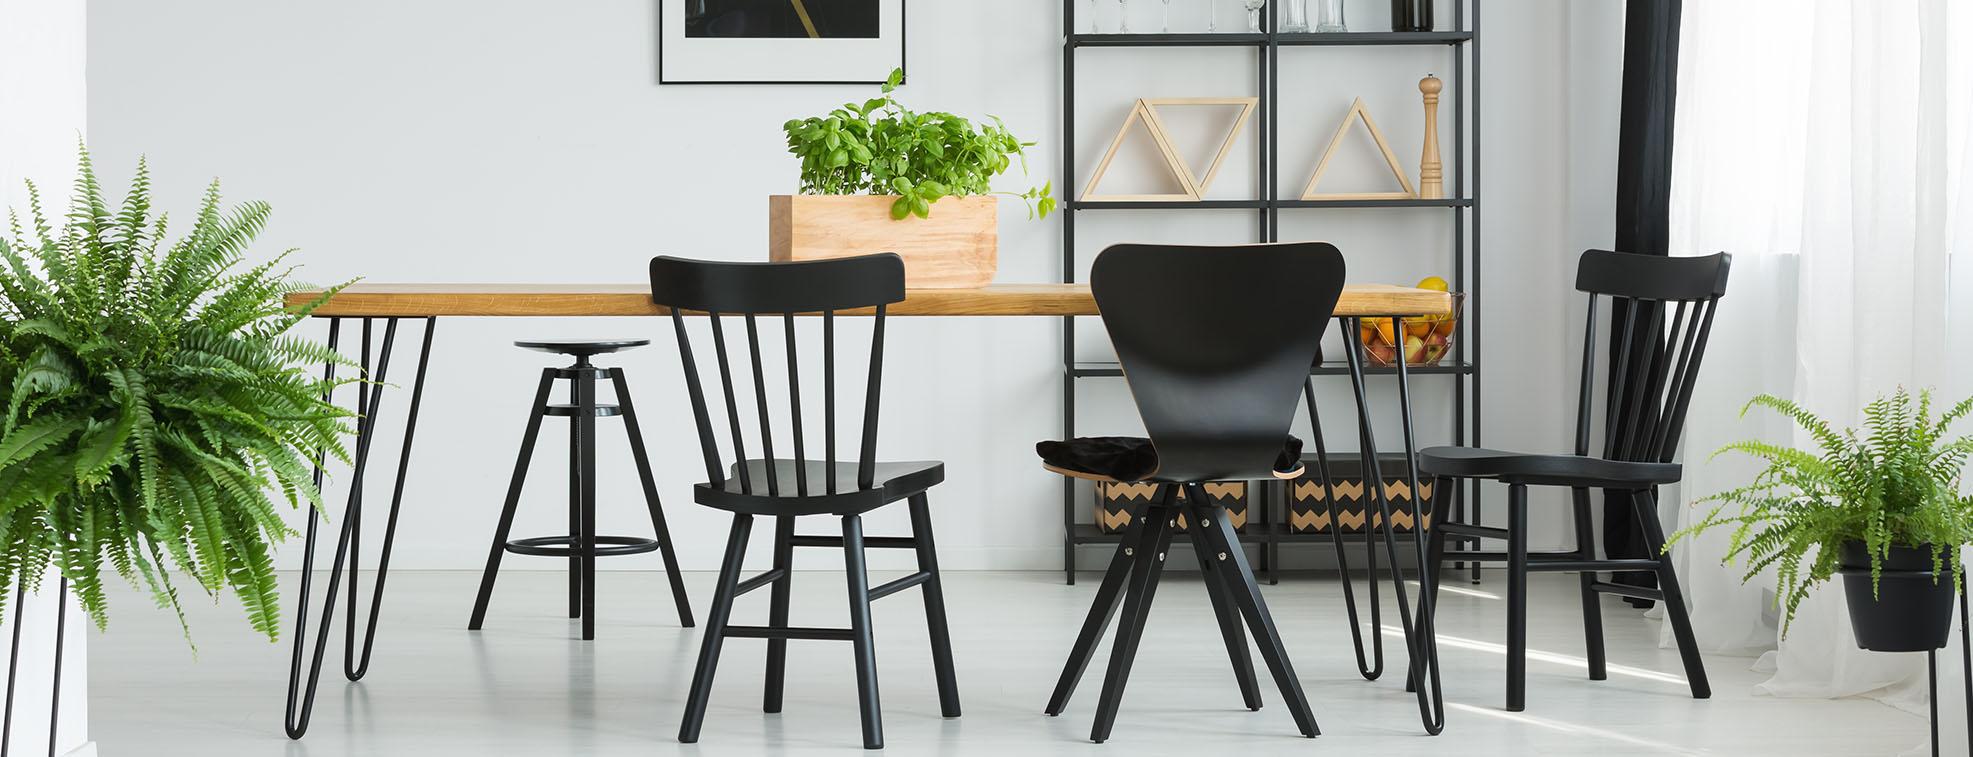 Scandinavian Modern Interior Design Styles